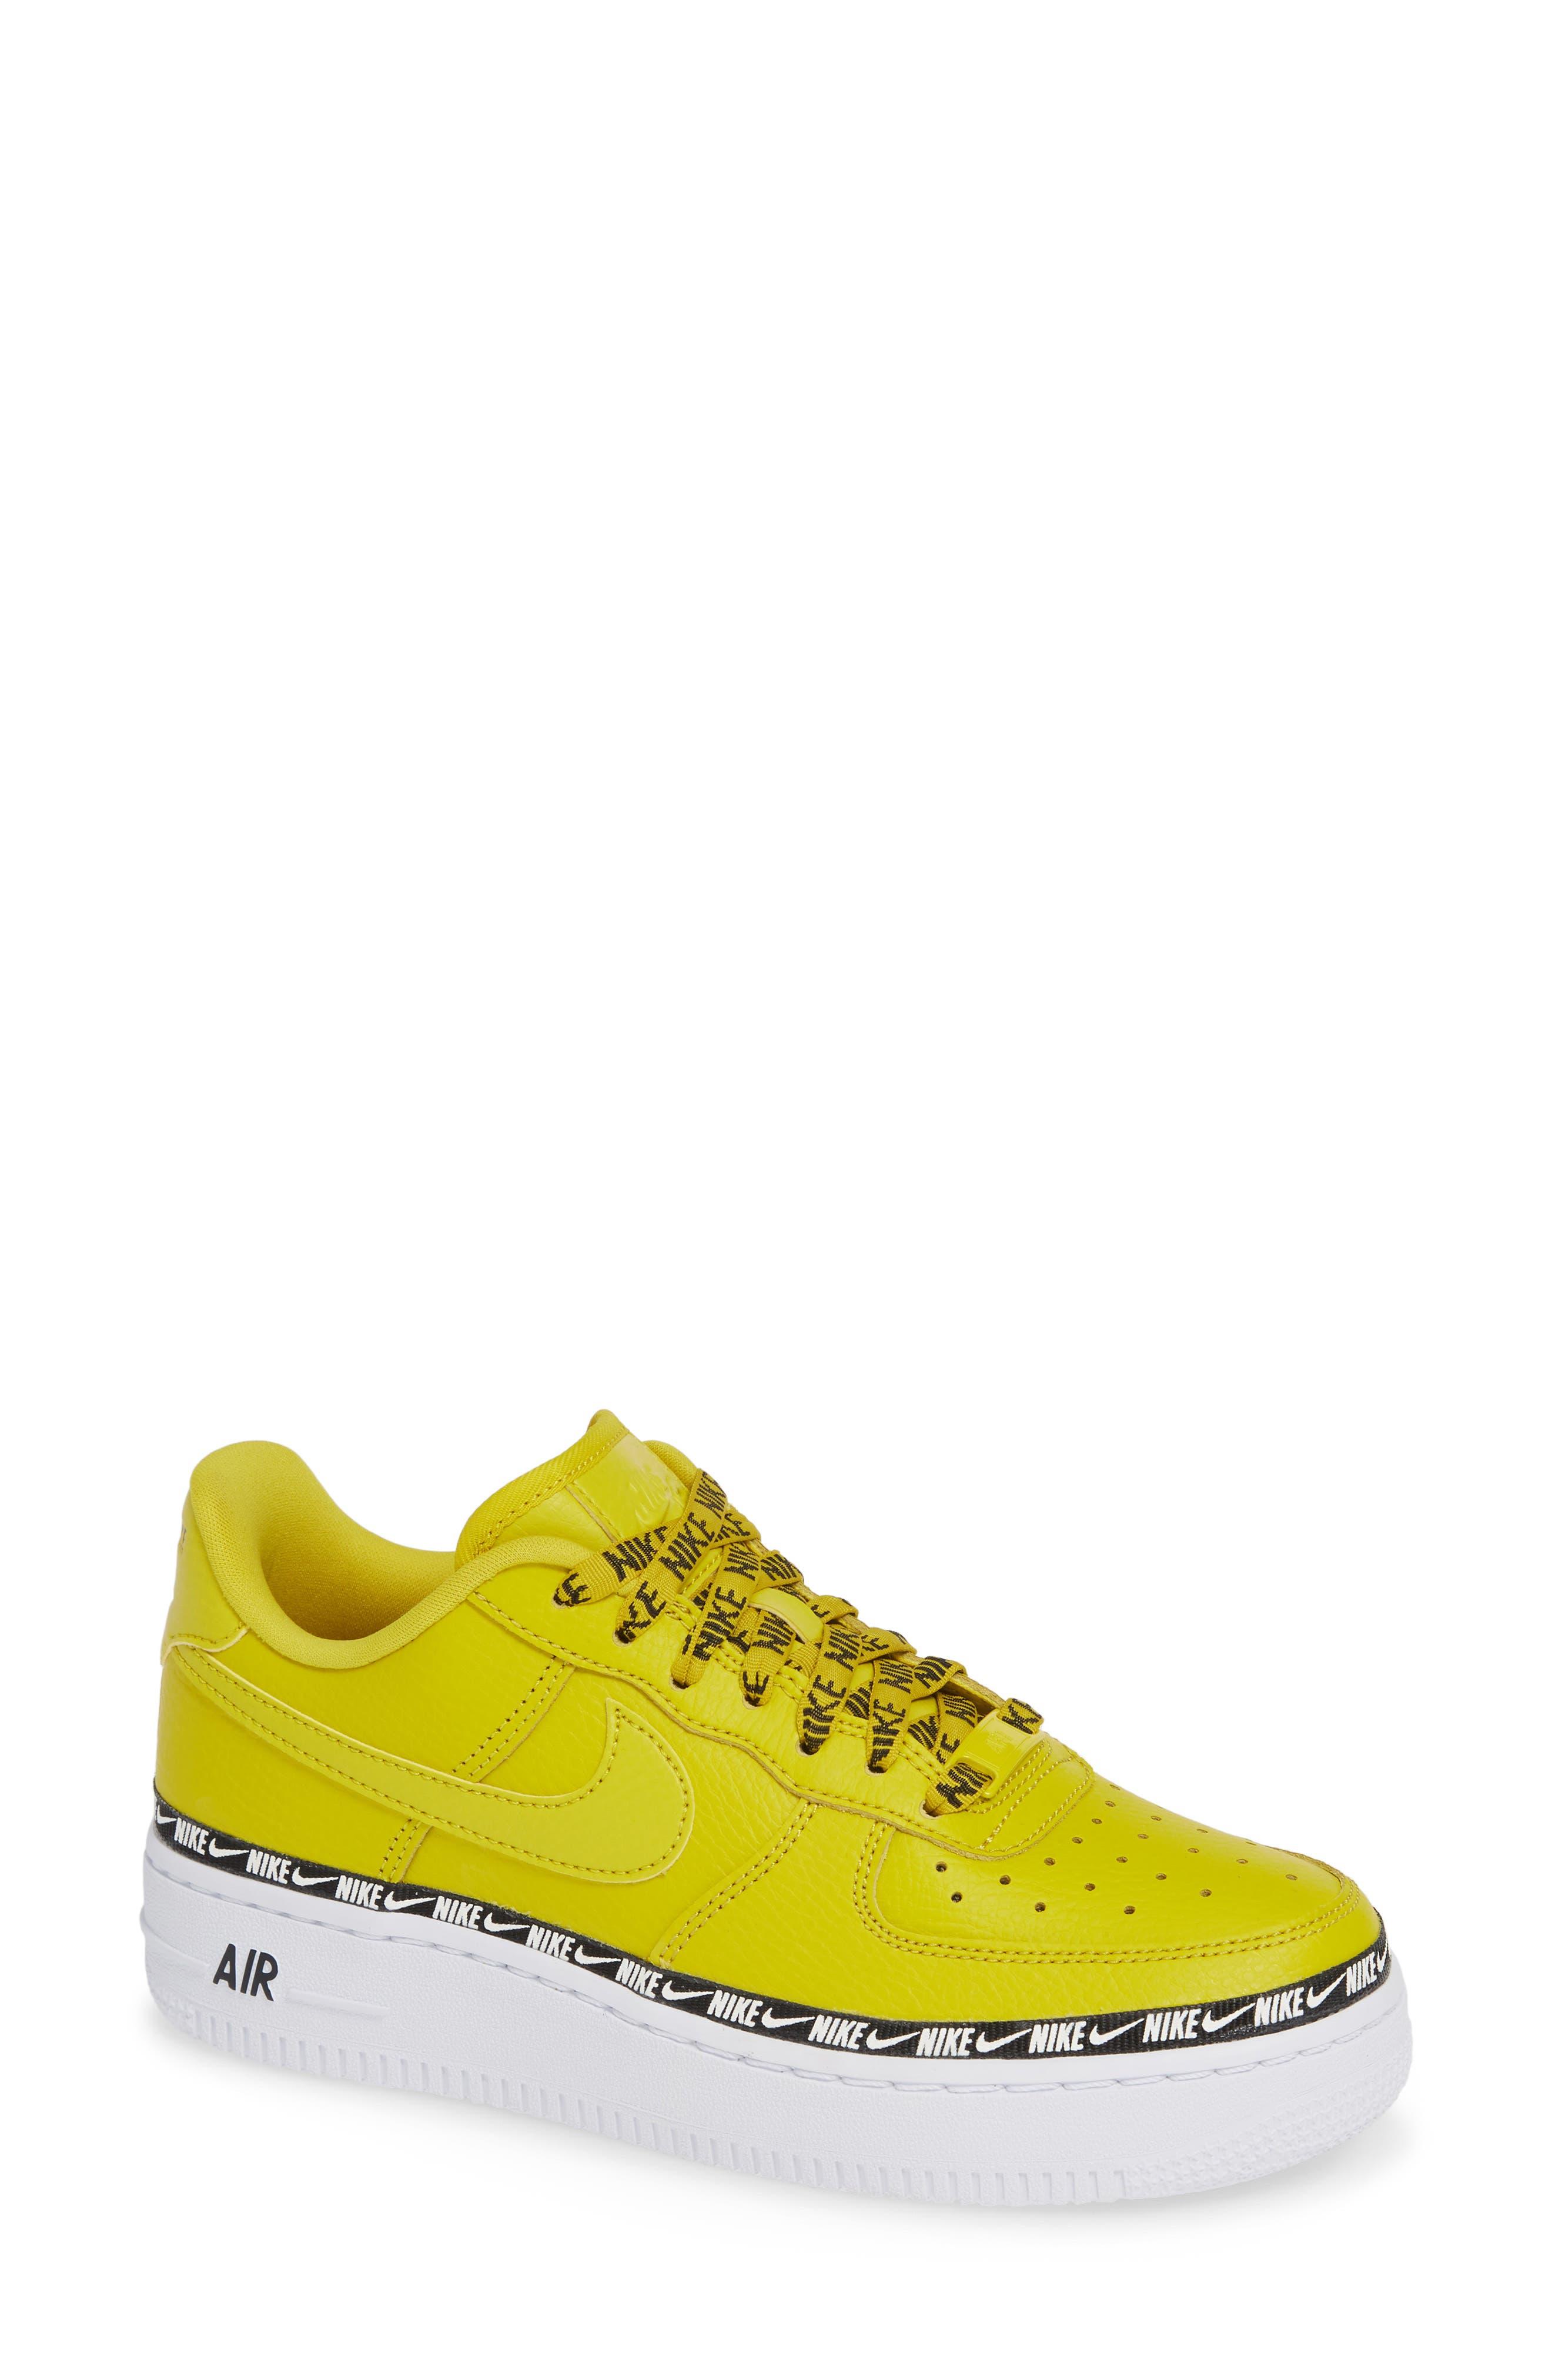 Air Force 1 '07 SE Premium Sneaker,                         Main,                         color, BRIGHT CITRON/ BLACK/ WHITE